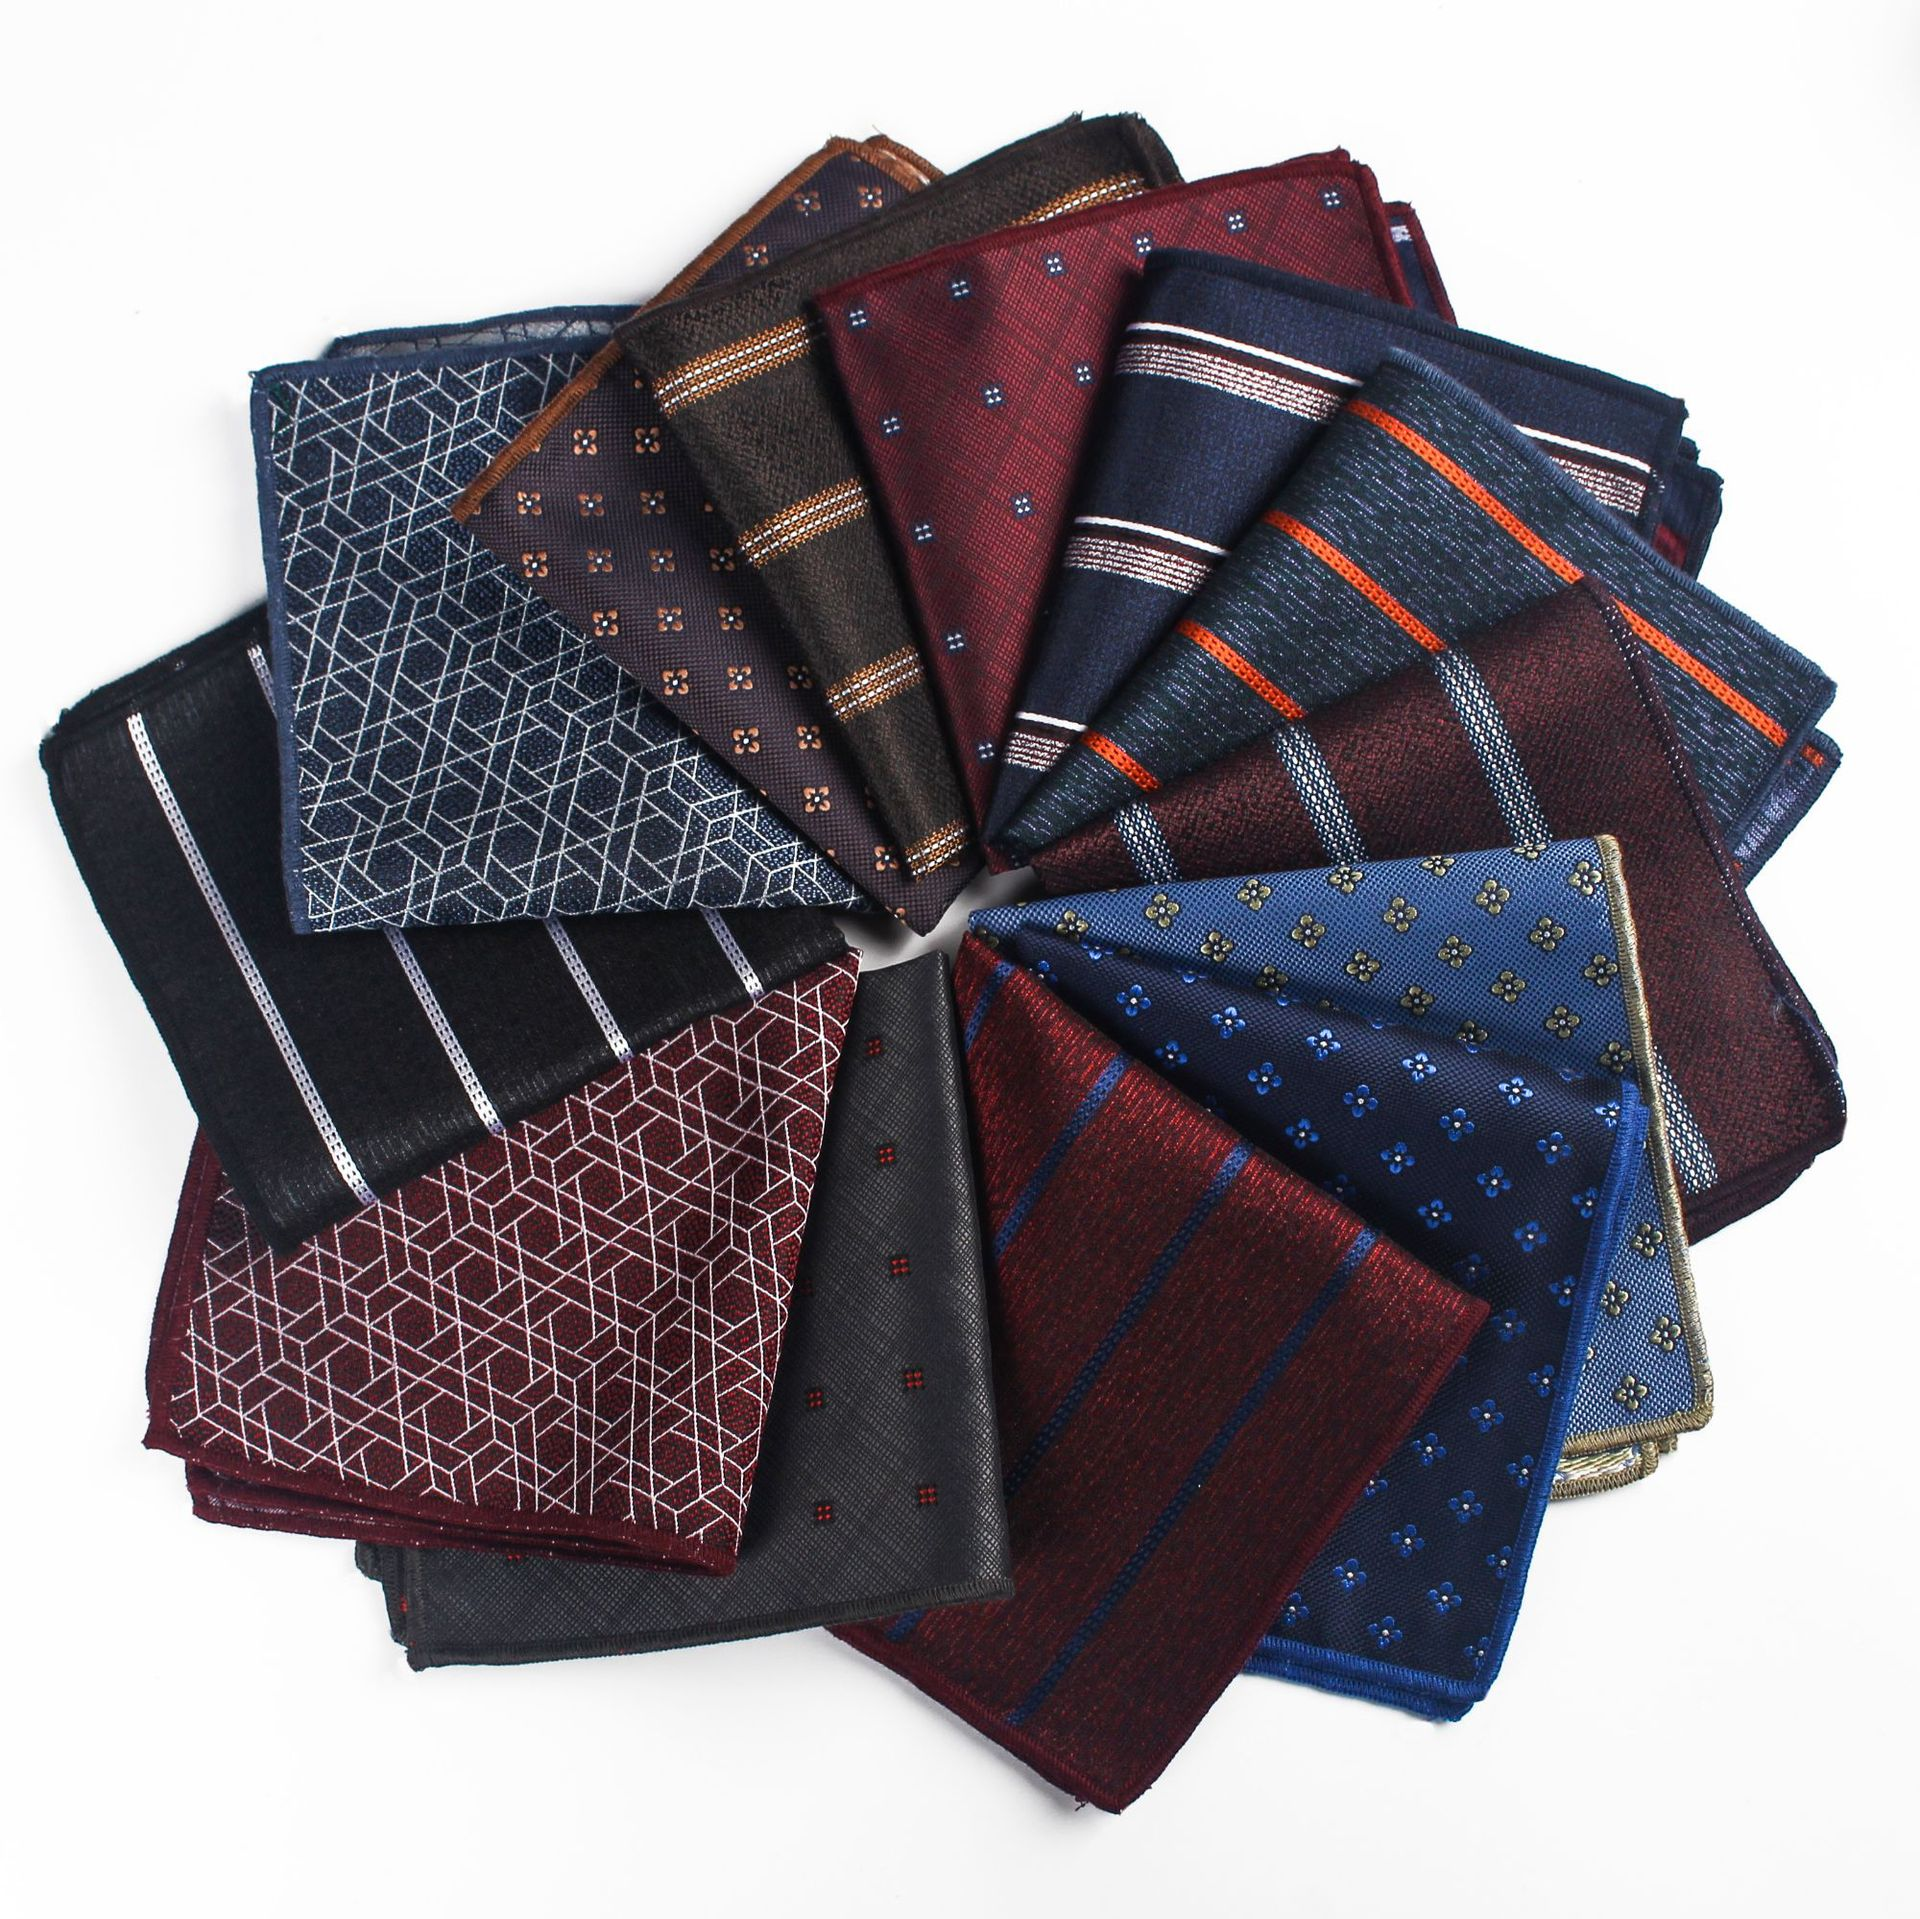 Hot Sale 24*24cm Polyester Jacquard Retro Men's Business Pocket Towel For Wedding Prom Party Women Pocket Square Towel